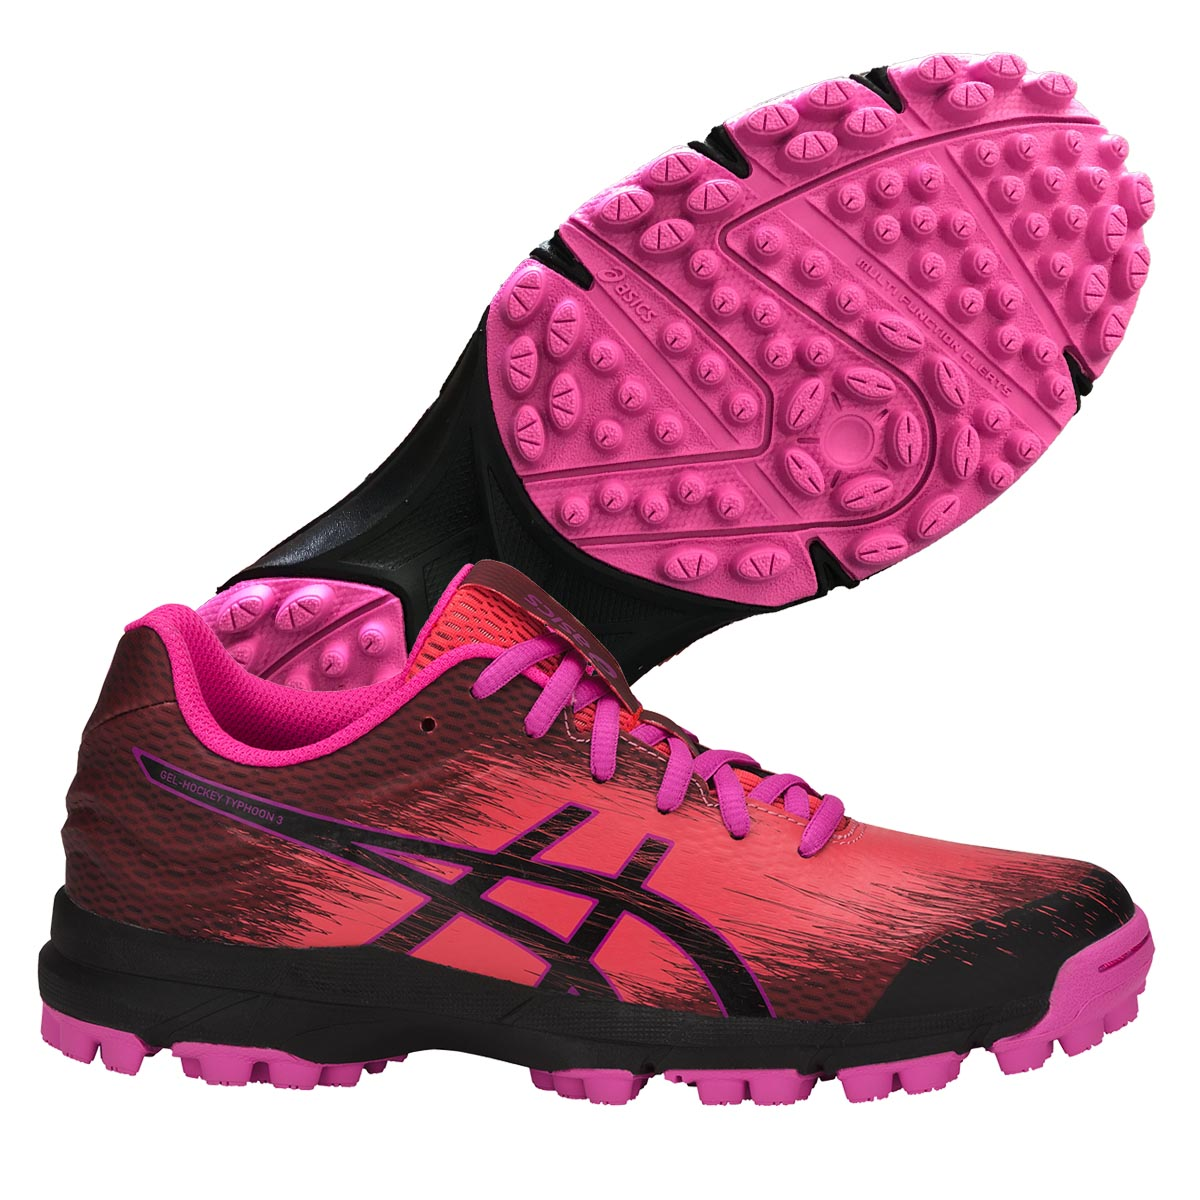 asics hockey shoes womens quality